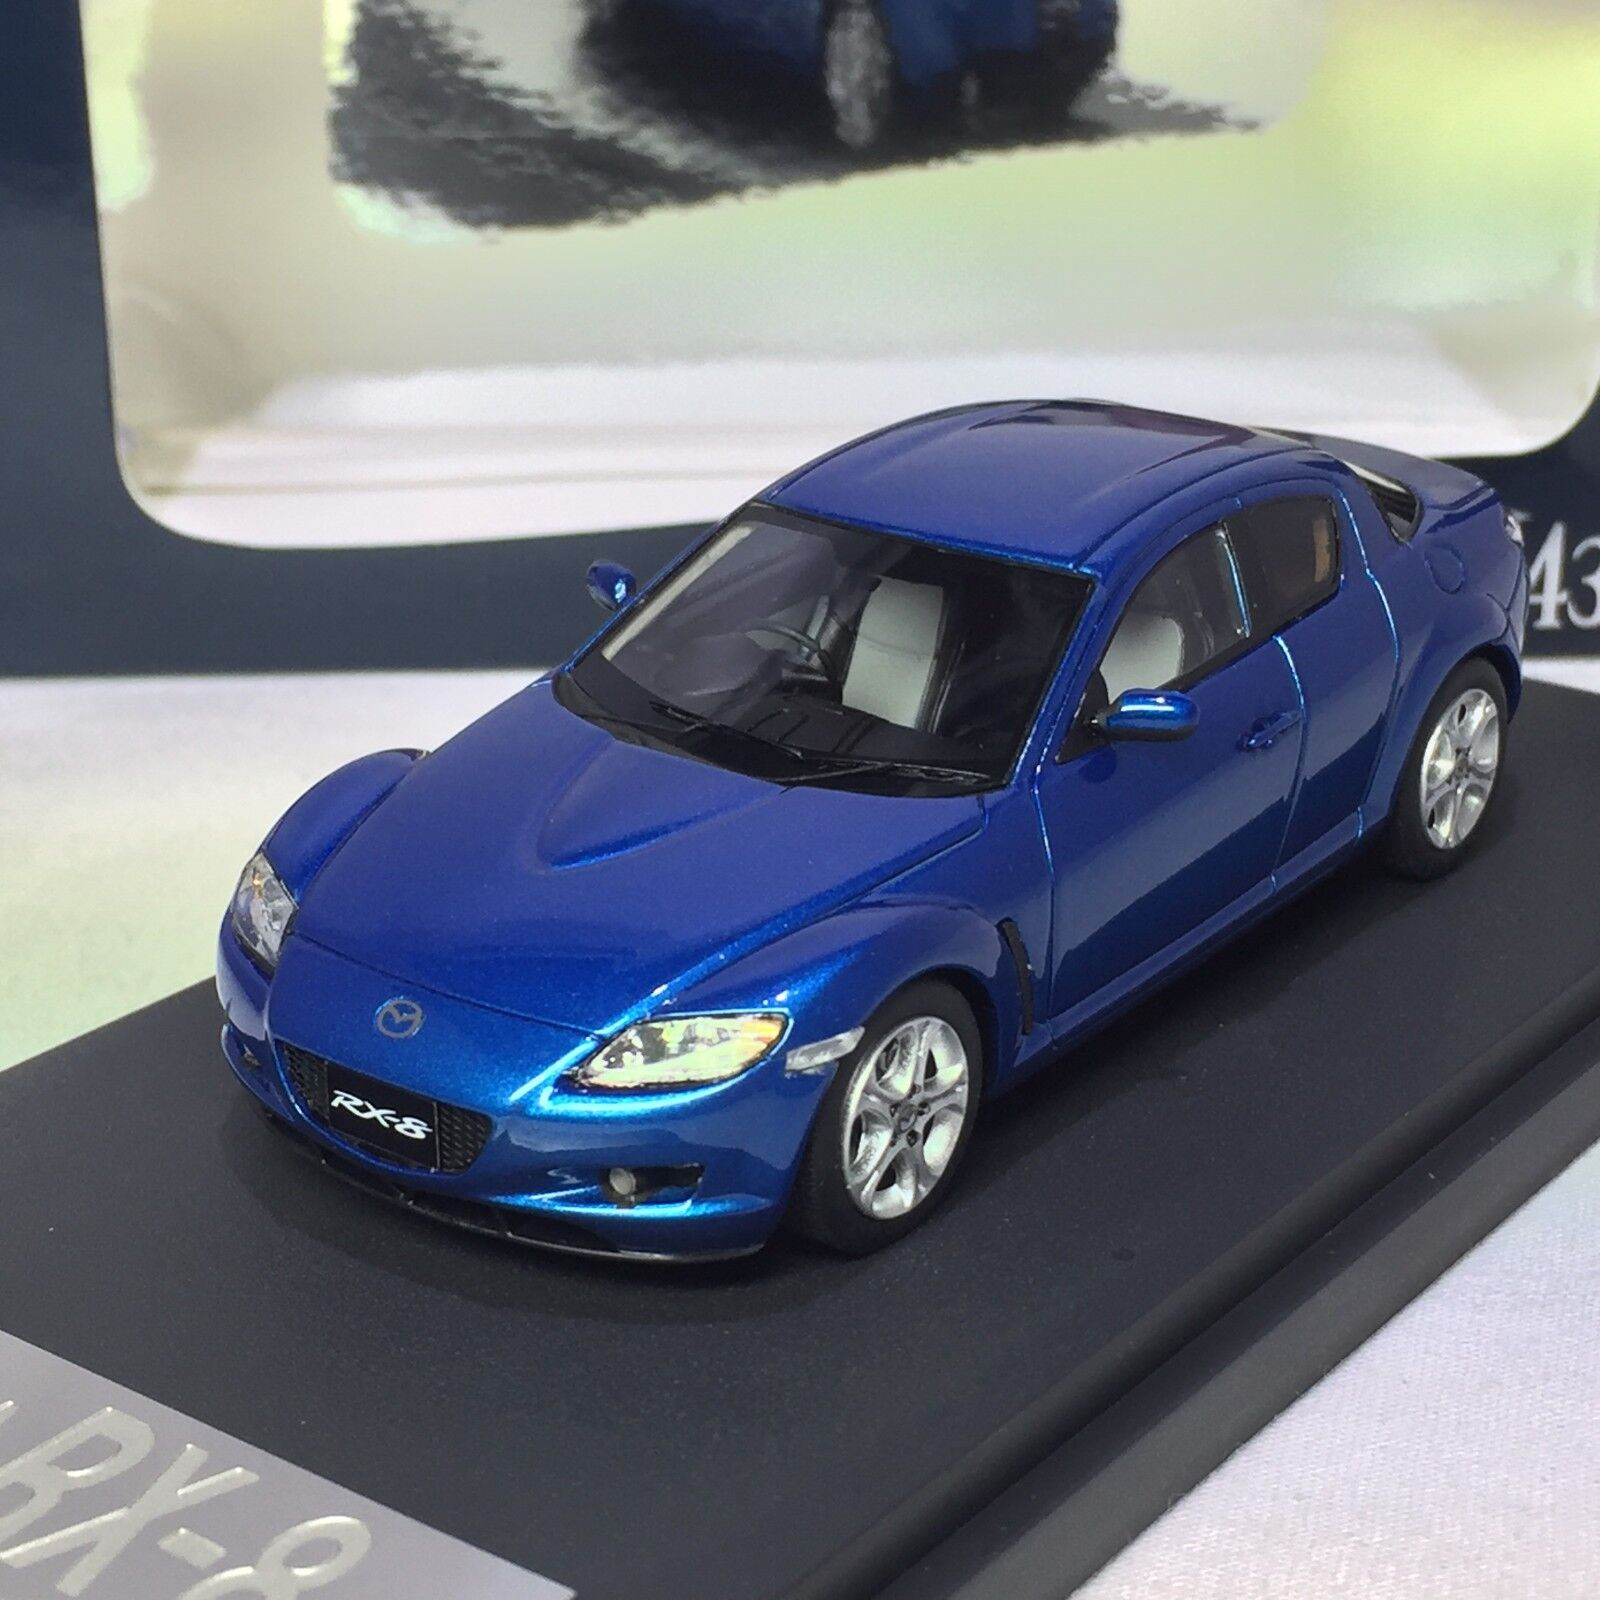 1 43 43 43 scale Mark43 Mazda RX-8 SE3P Winning bluee Metallic PM4342BL b81e64